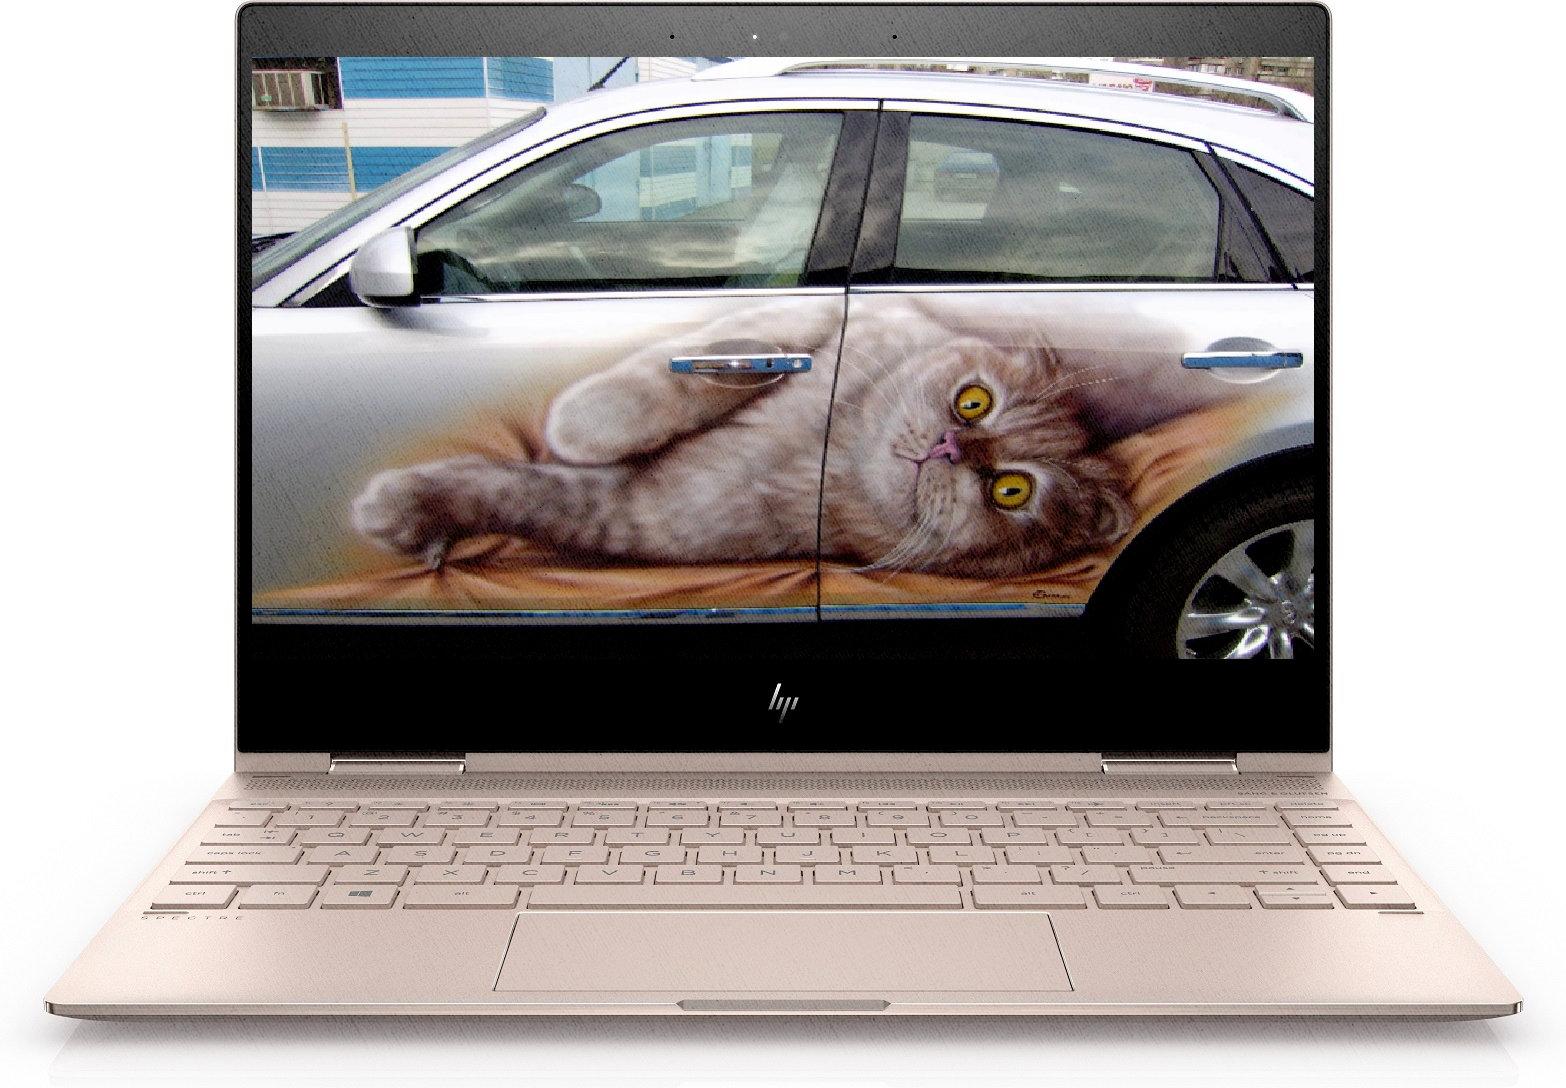 HP Spectre 13-ae013ur x360